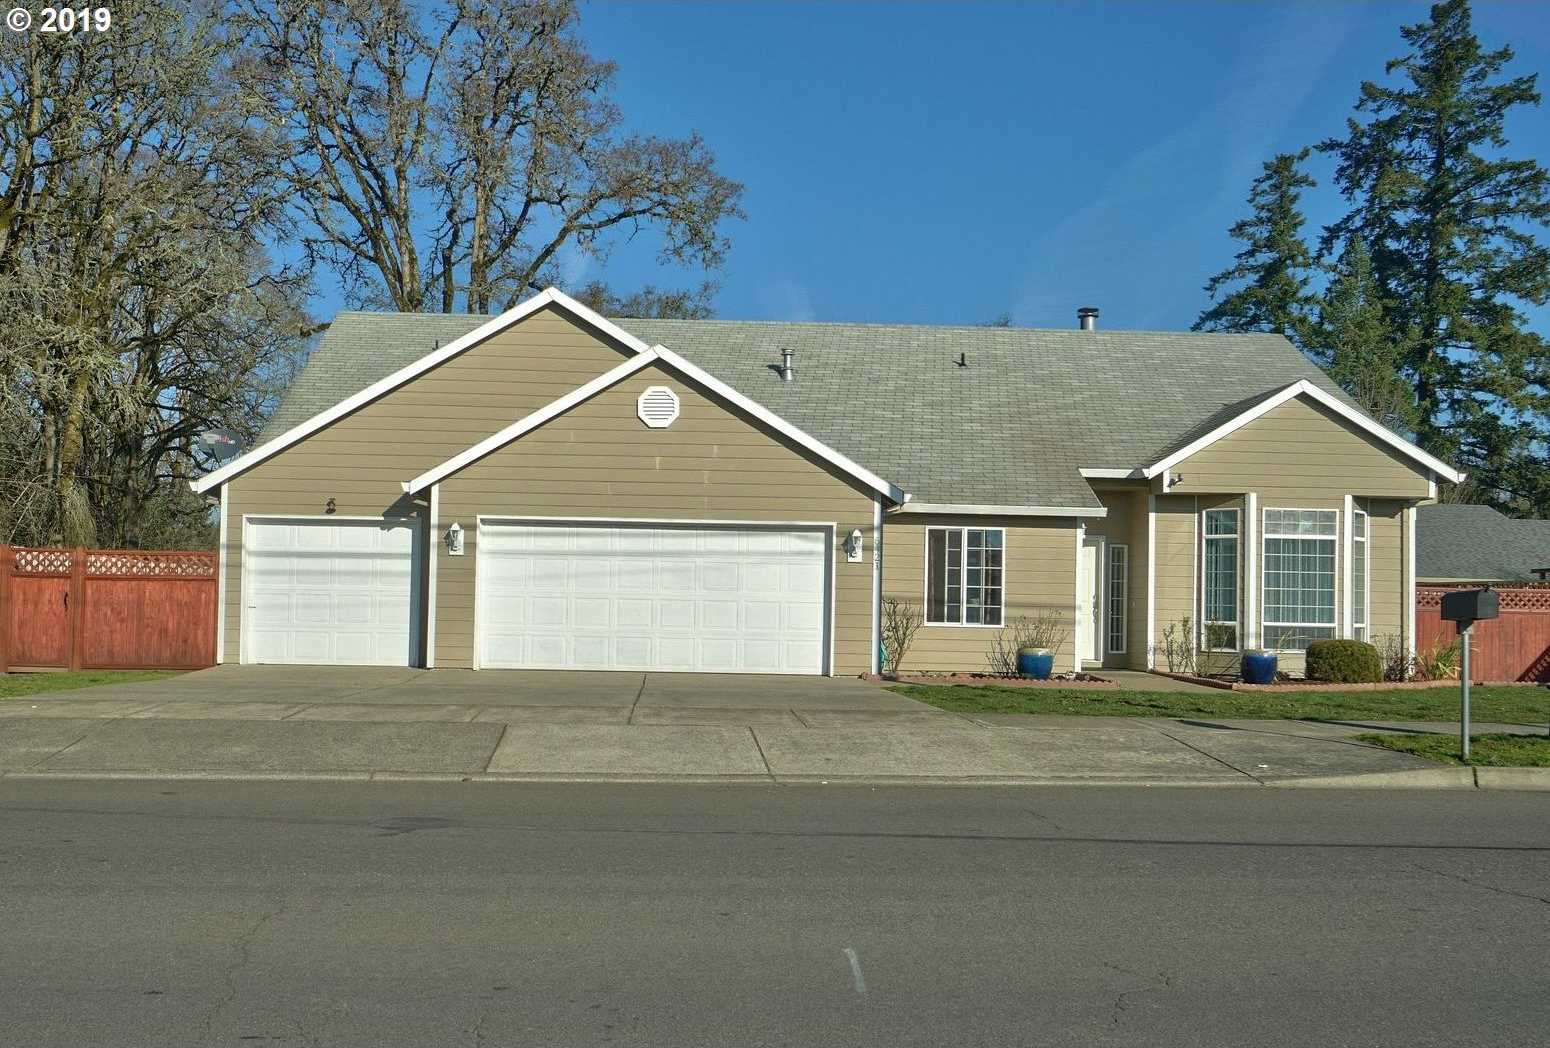 $498,000 - 4Br/3Ba -  for Sale in Hillsboro